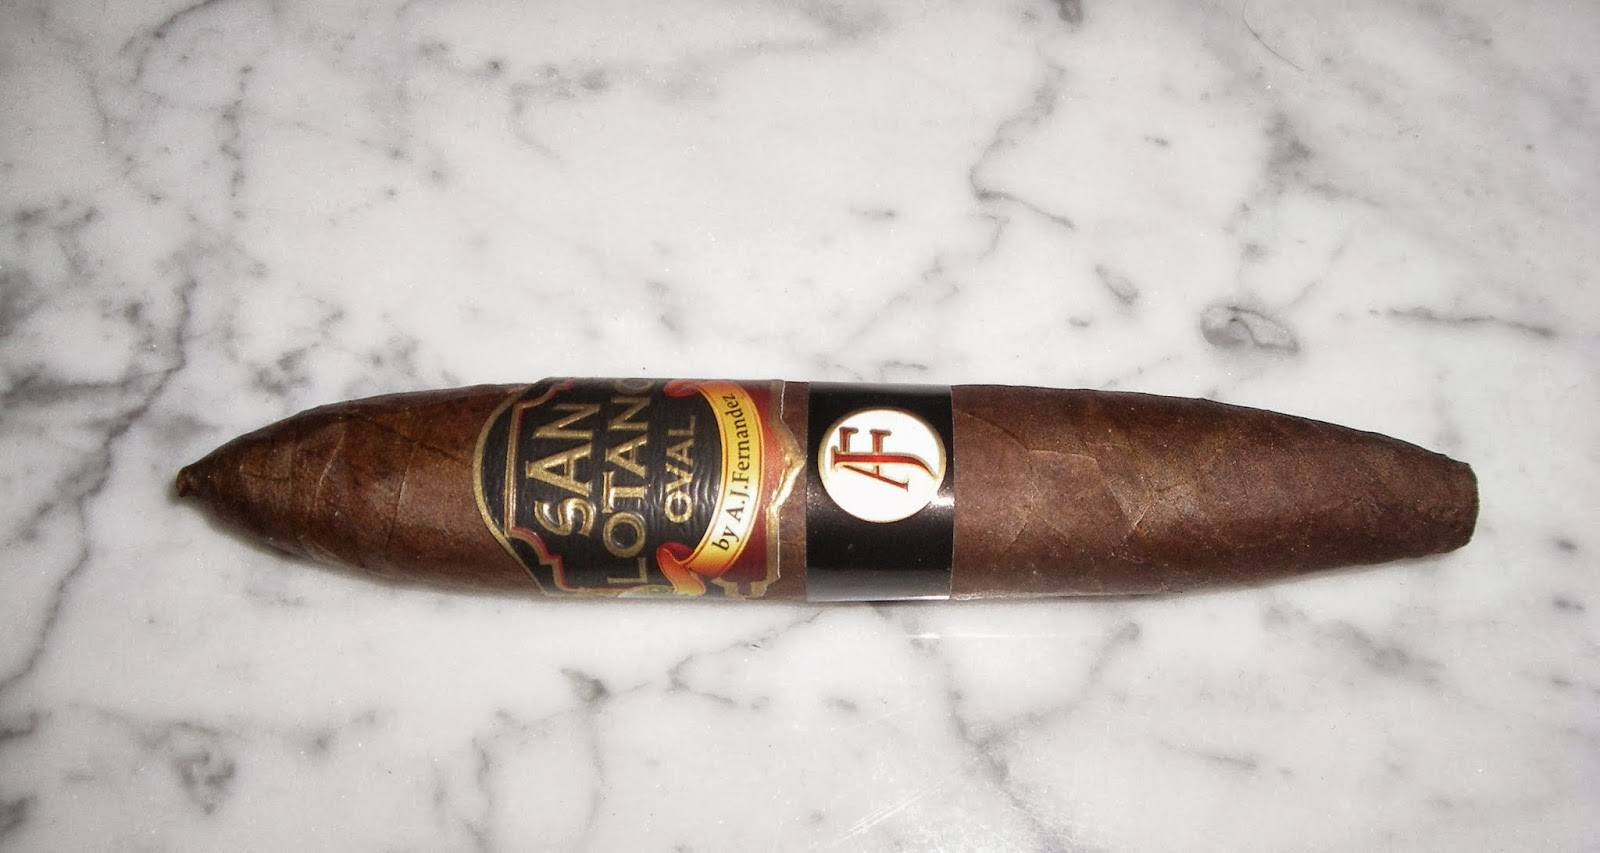 Cigar Review: San Lotano Oval Habano Limited Edition Pigskin Super Smoke Figurado XLVIII